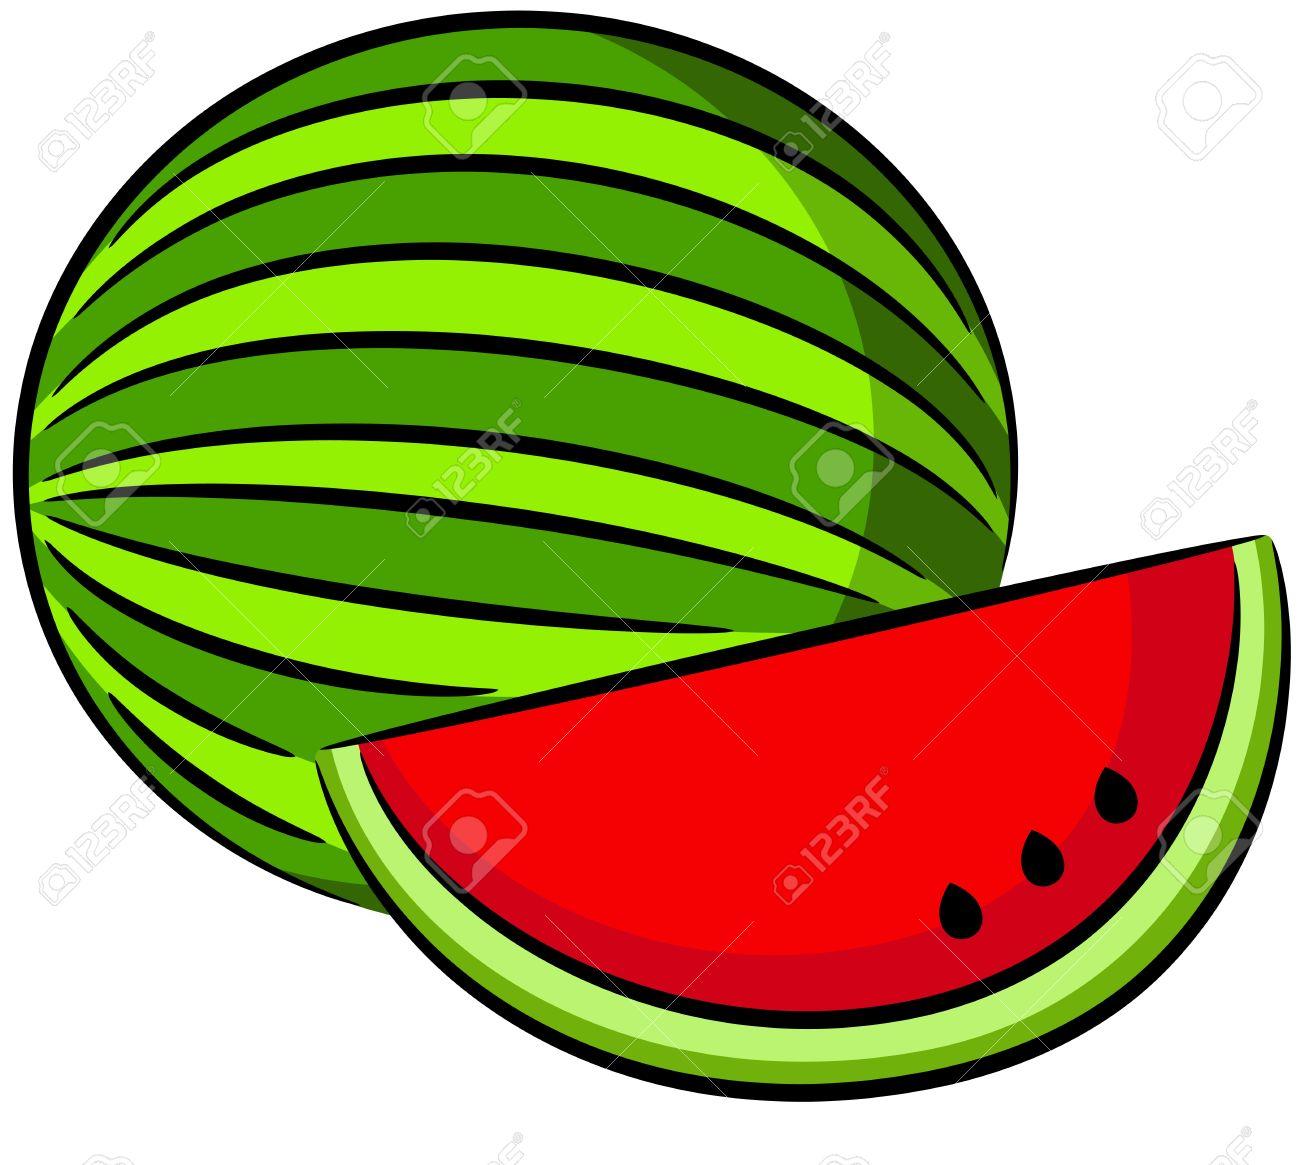 Melon Clipart.